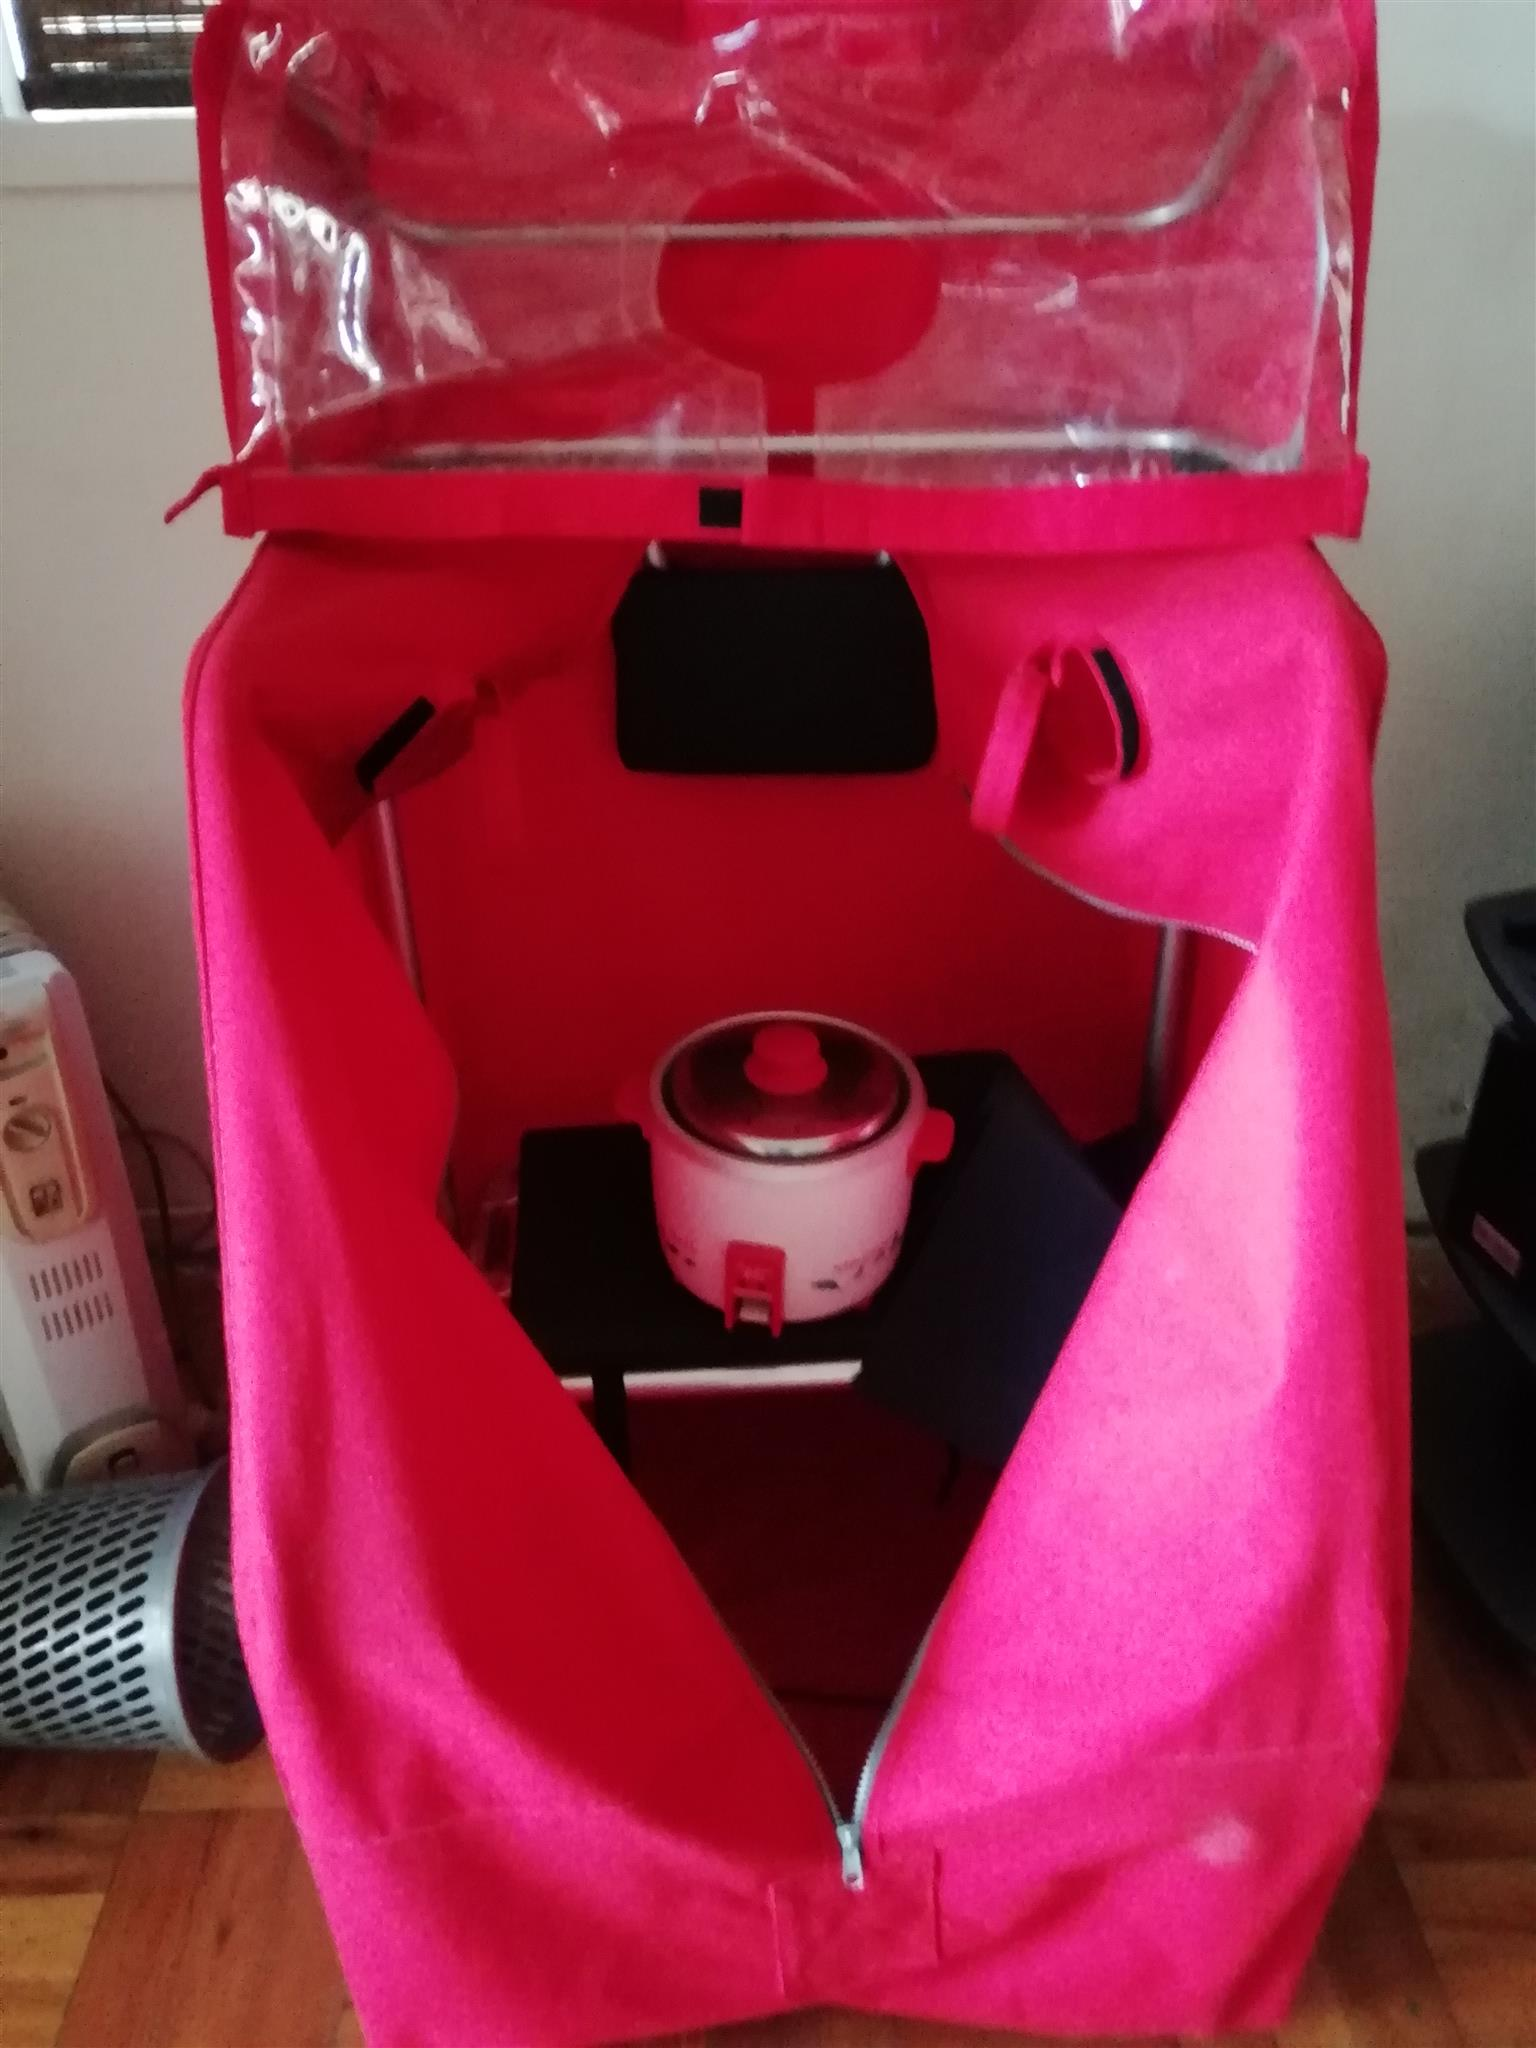 Sauna portable for home